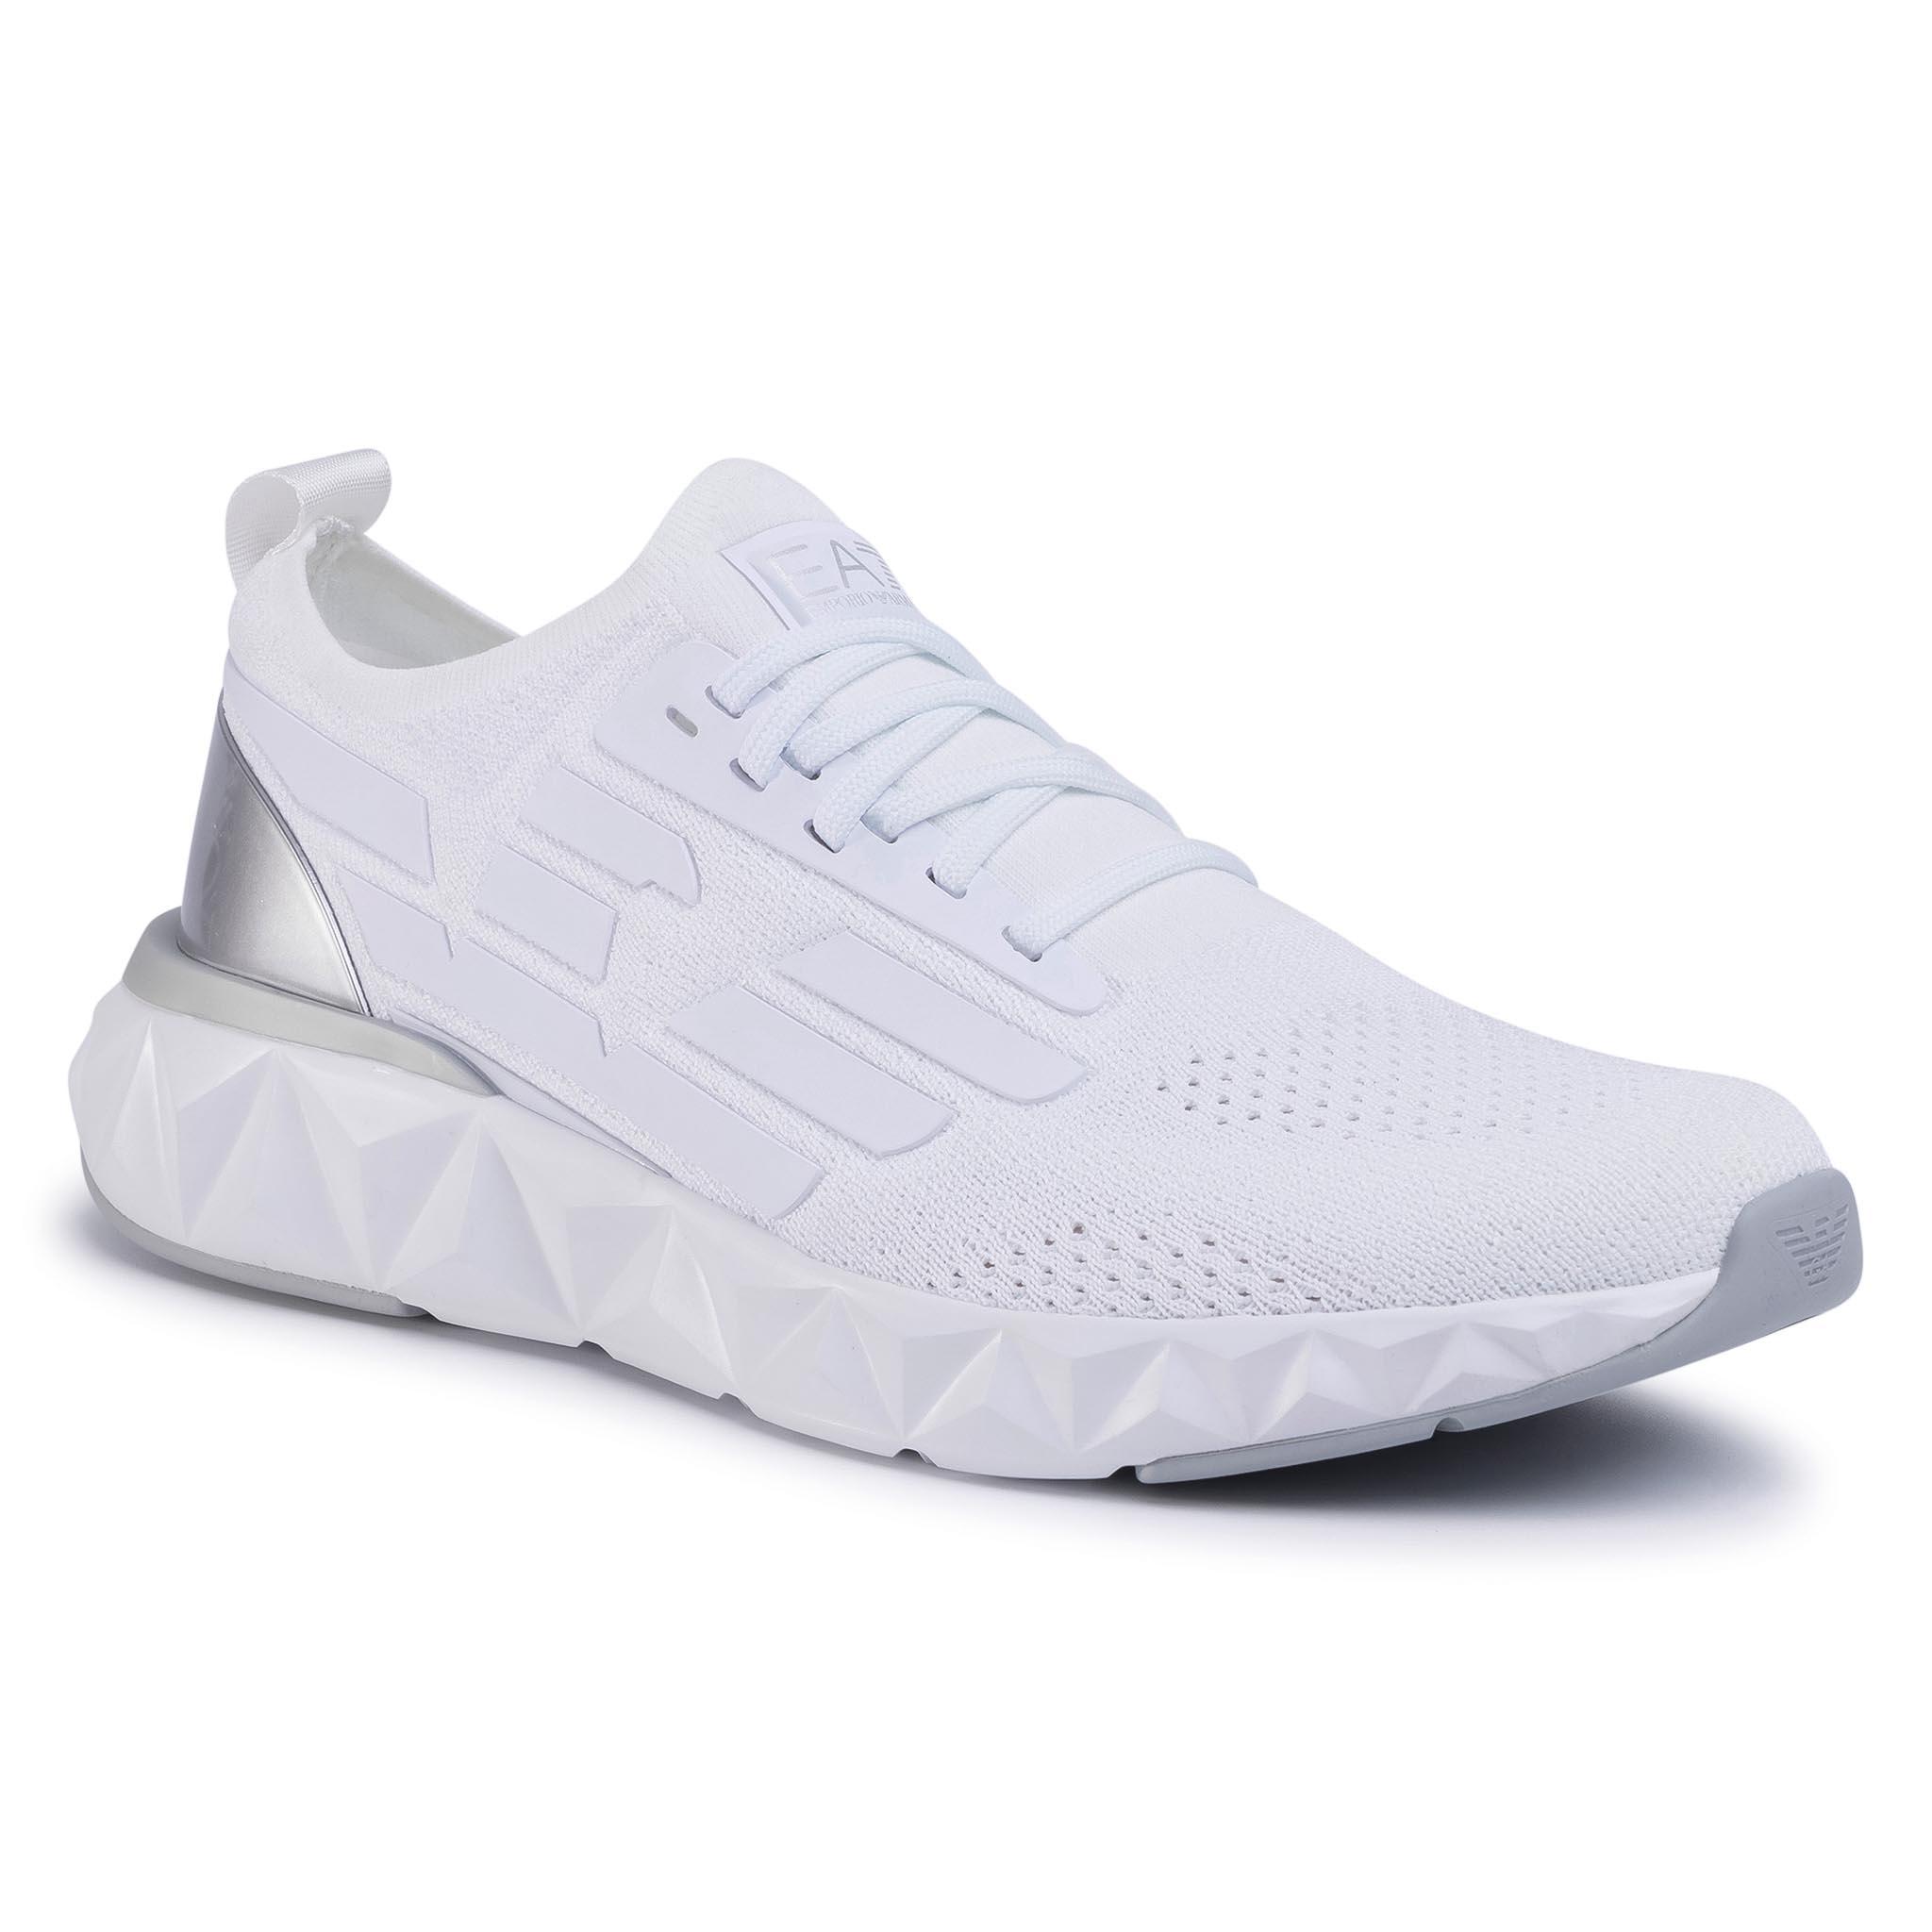 Sneakers EA7 EMPORIO ARMANI - X8X048 XK113 00175 White/Silver